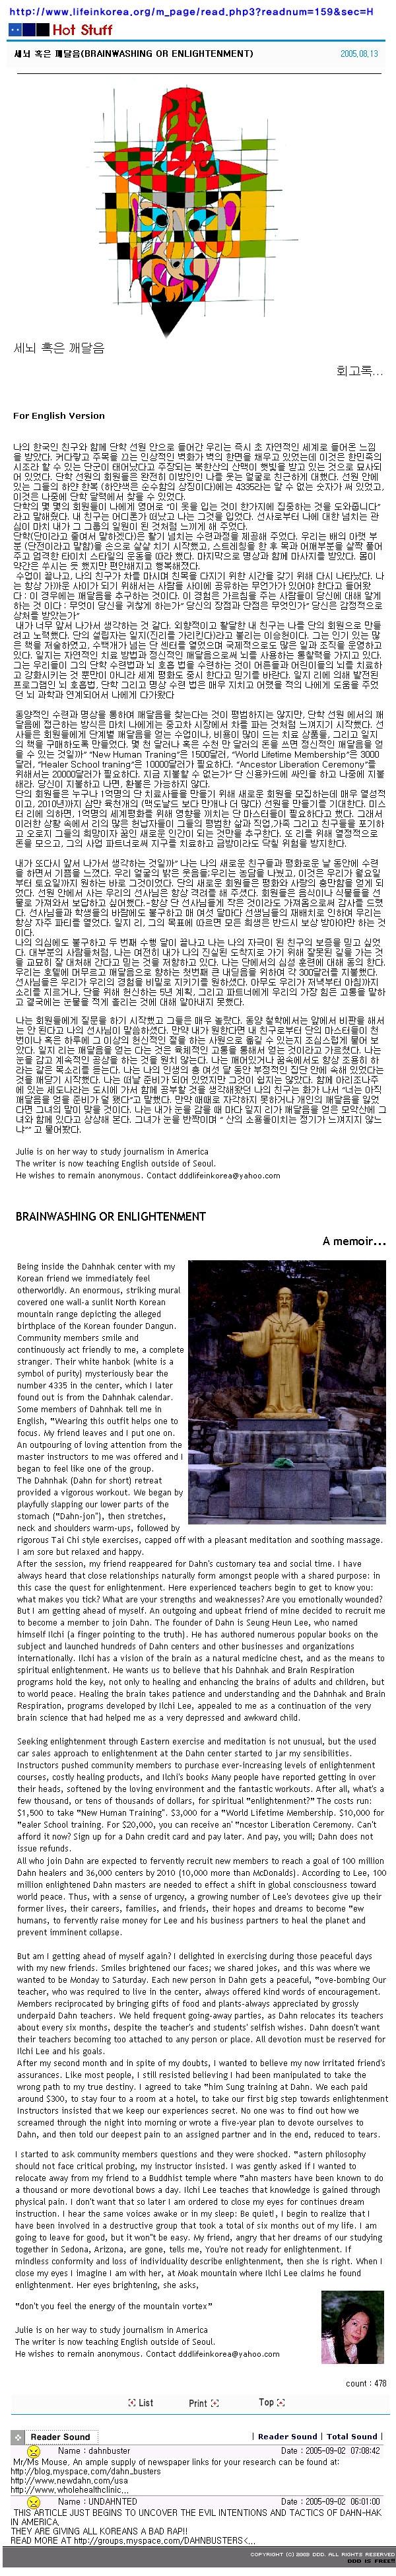 brainwashing[1]